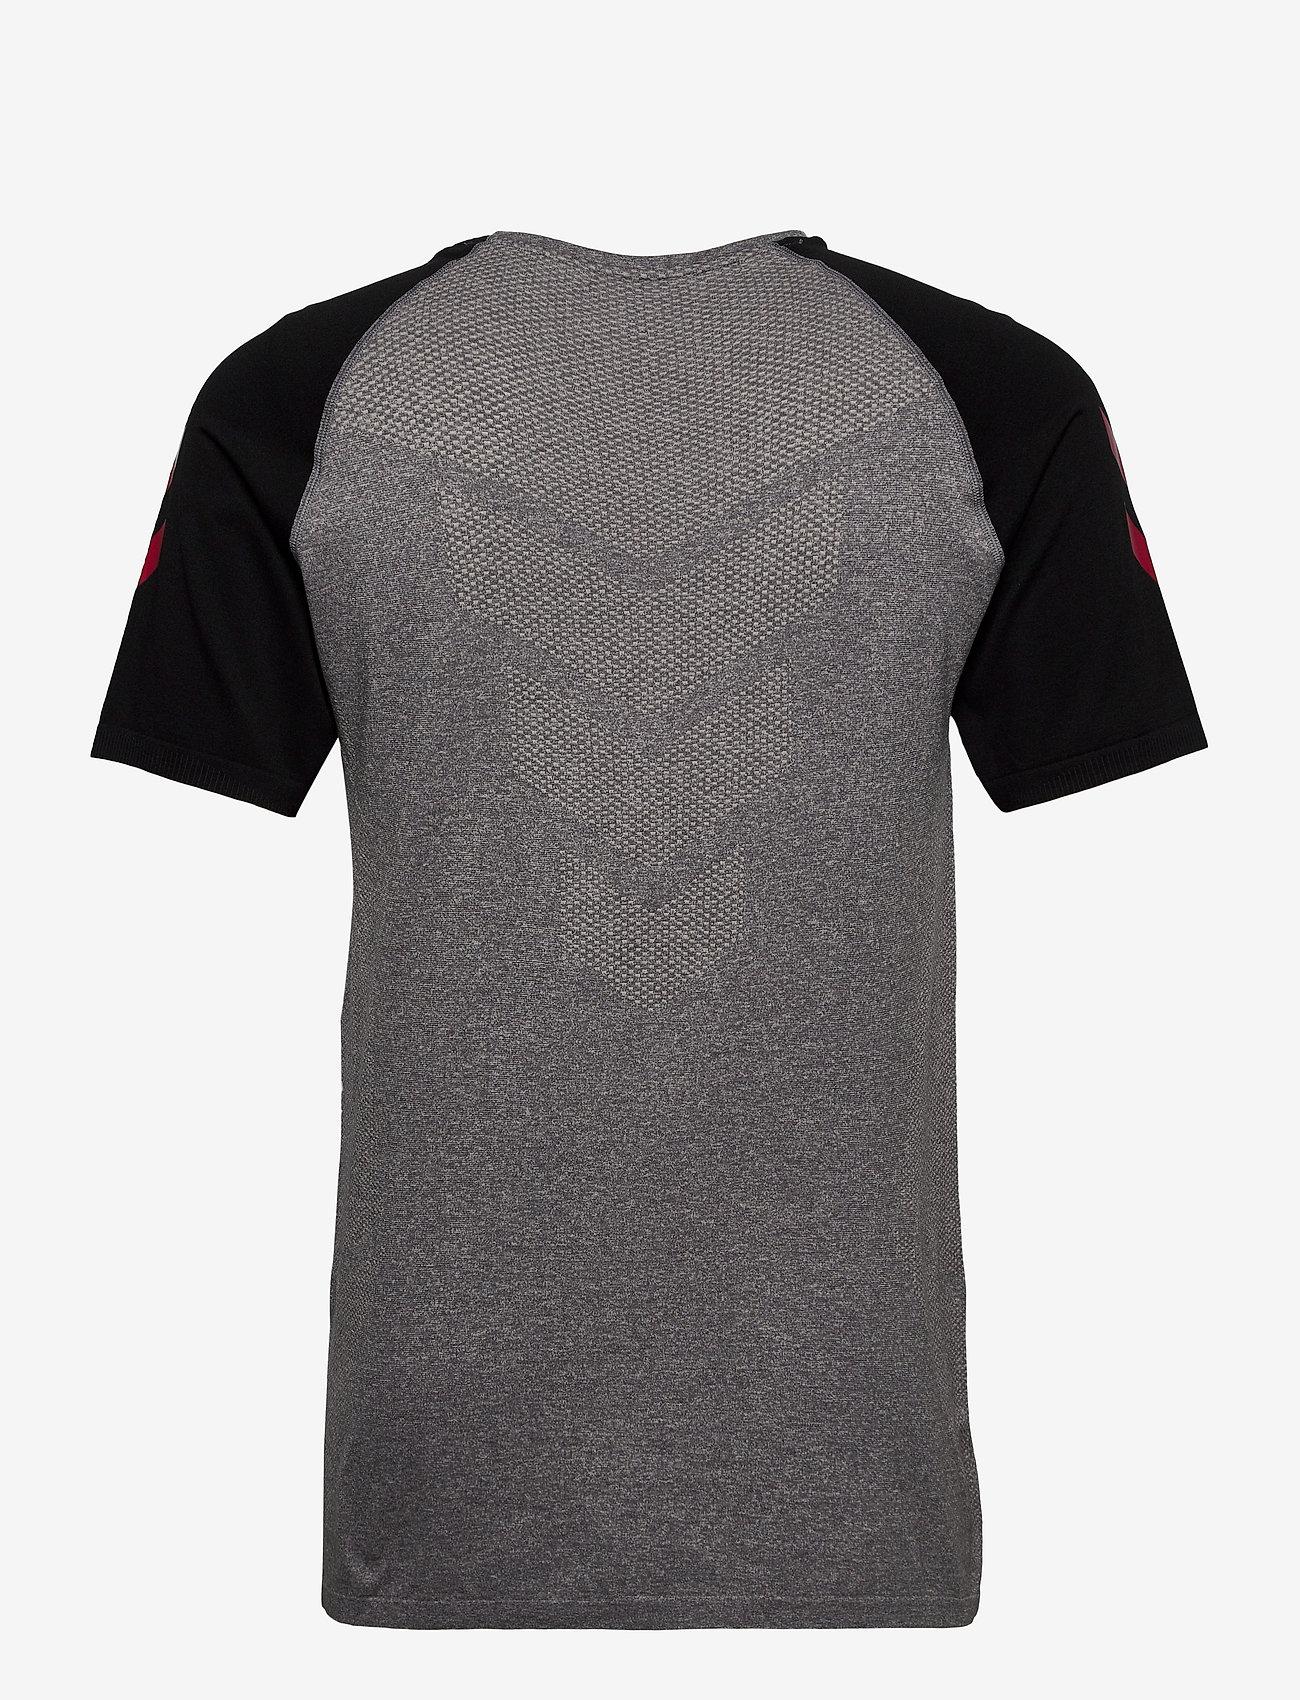 Hummel - DBU PLAYER PRO SEAMLESS JERSEY S/S - football shirts - dark grey melange - 1